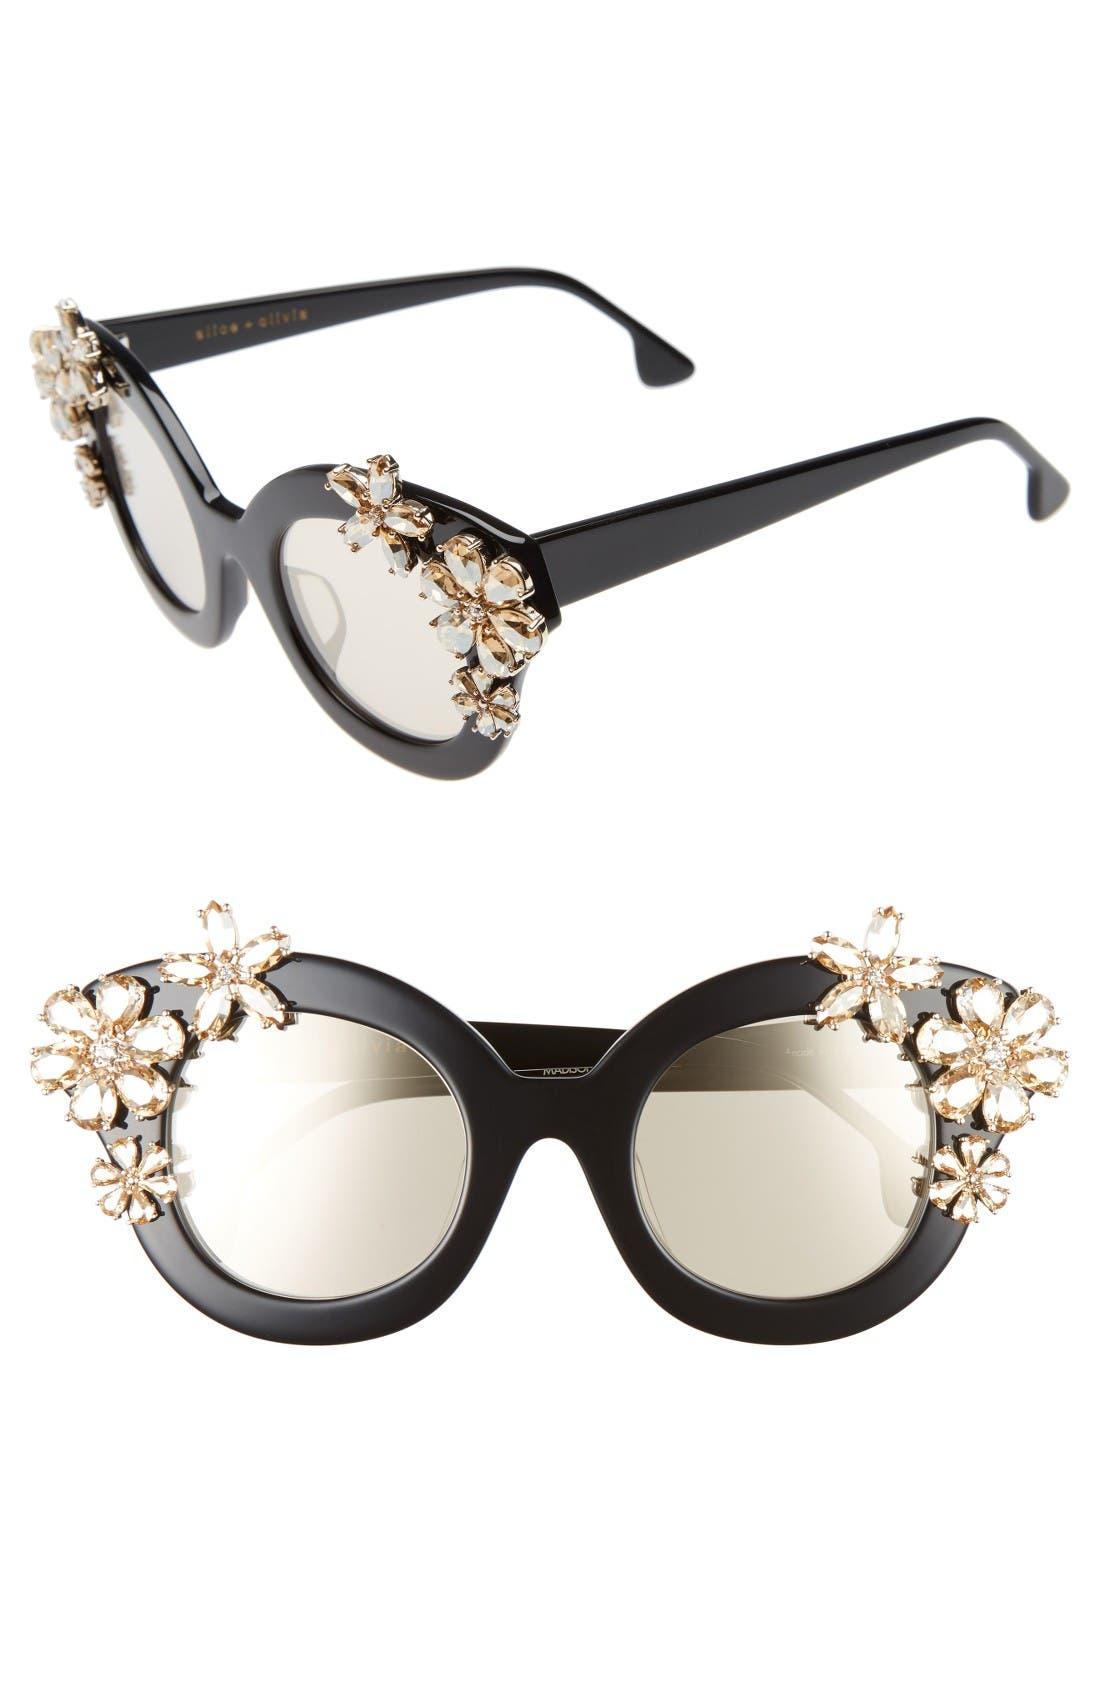 Madison Floral 46mm Special Fit Embellished Cat Eye Sunglasses,                         Main,                         color, Black